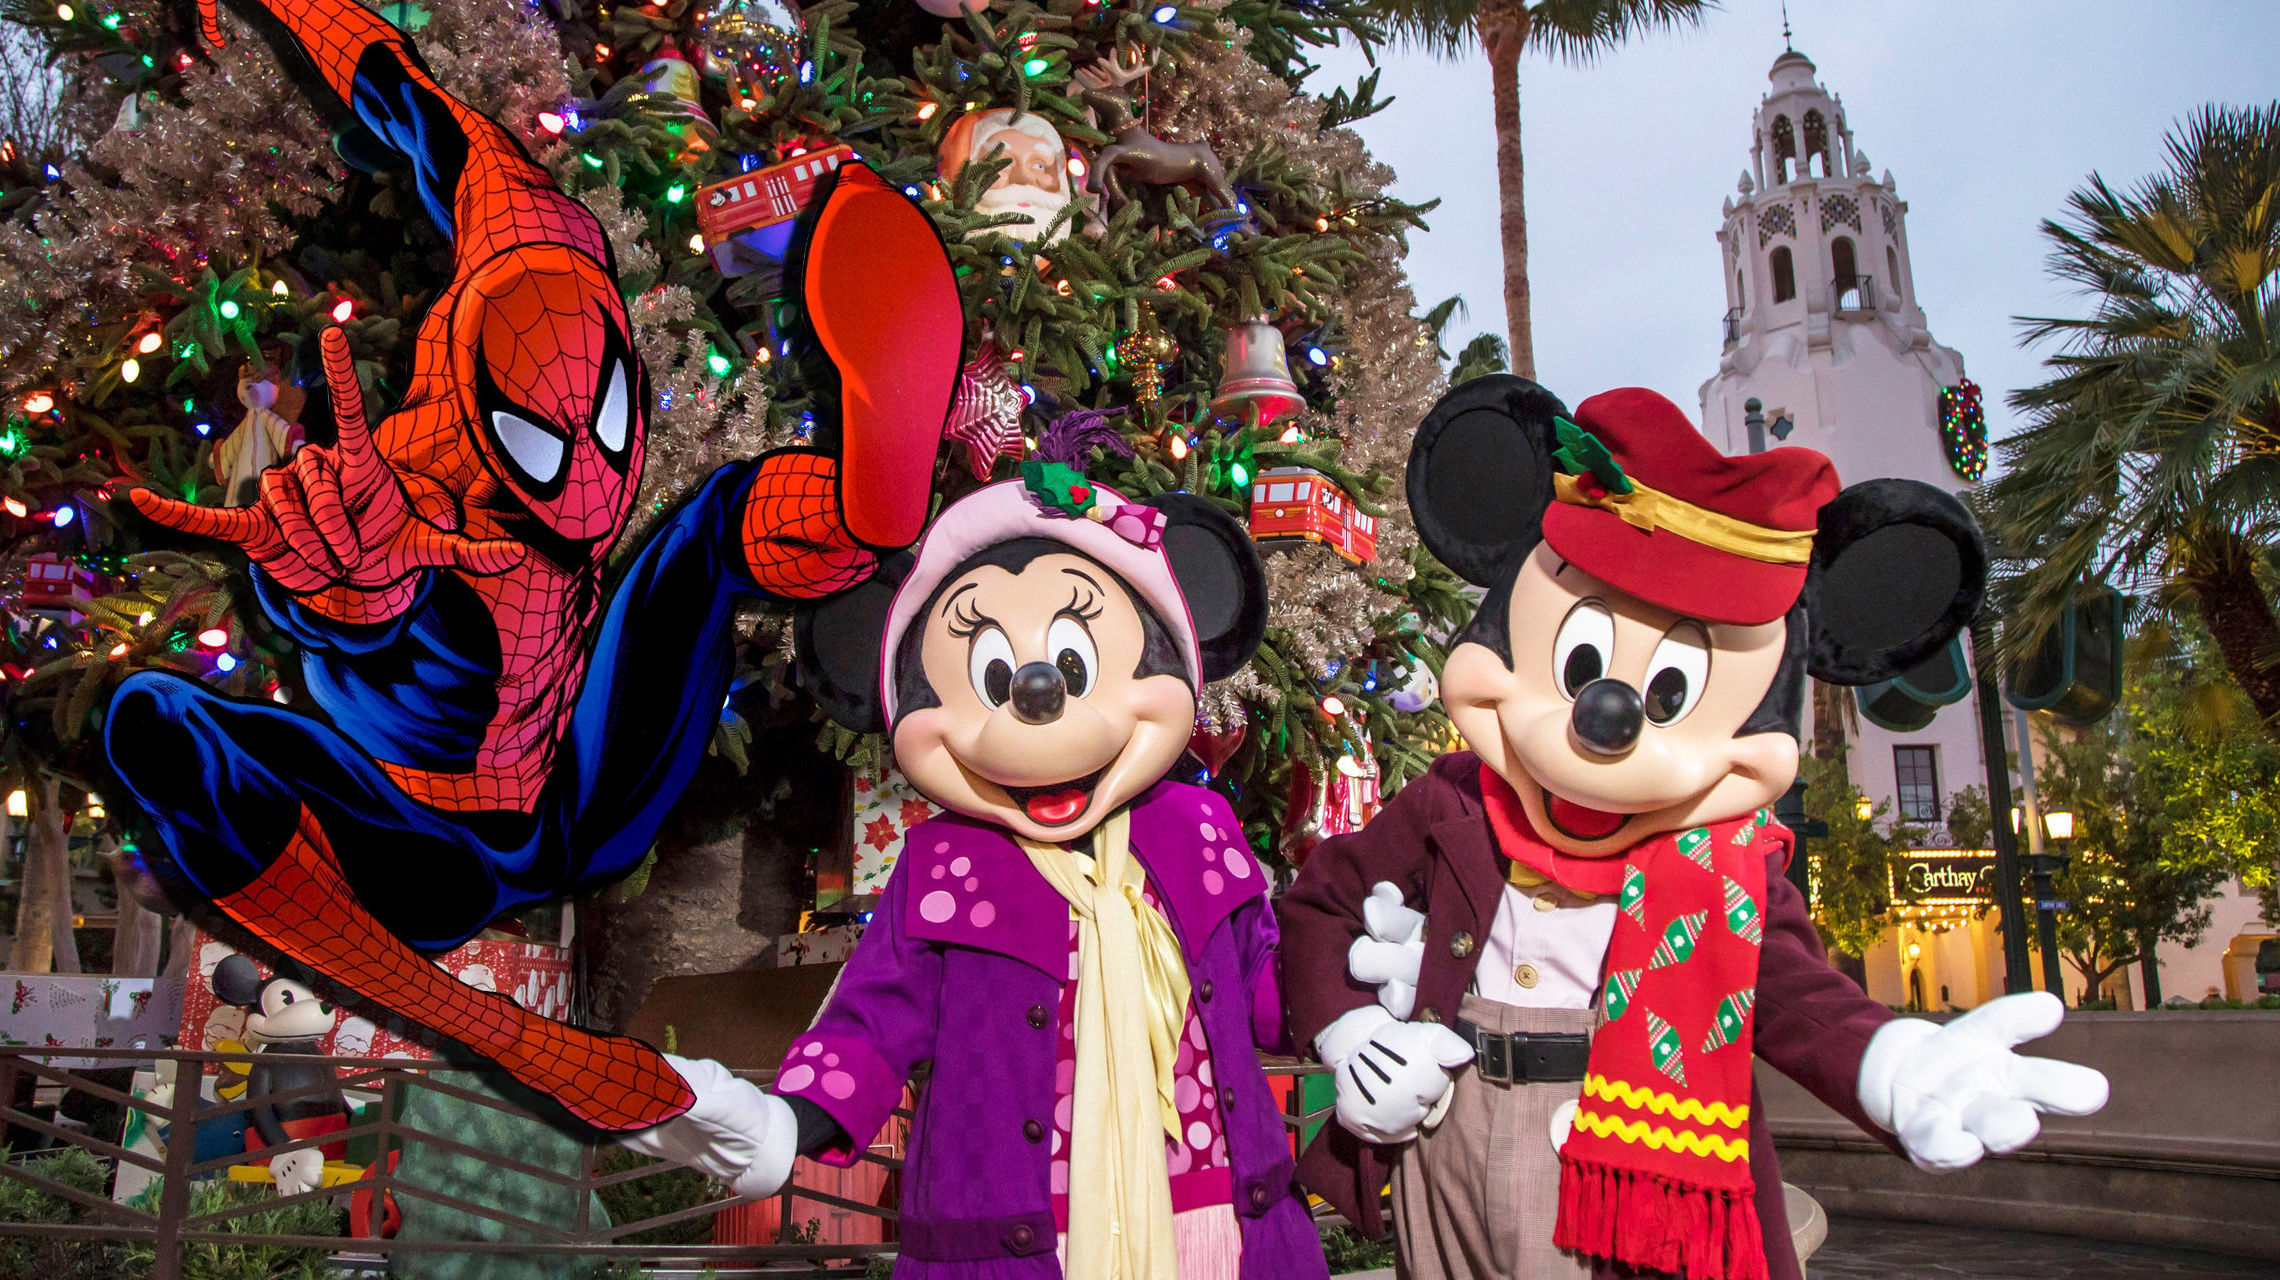 Disney's Marvel hotel is rising in